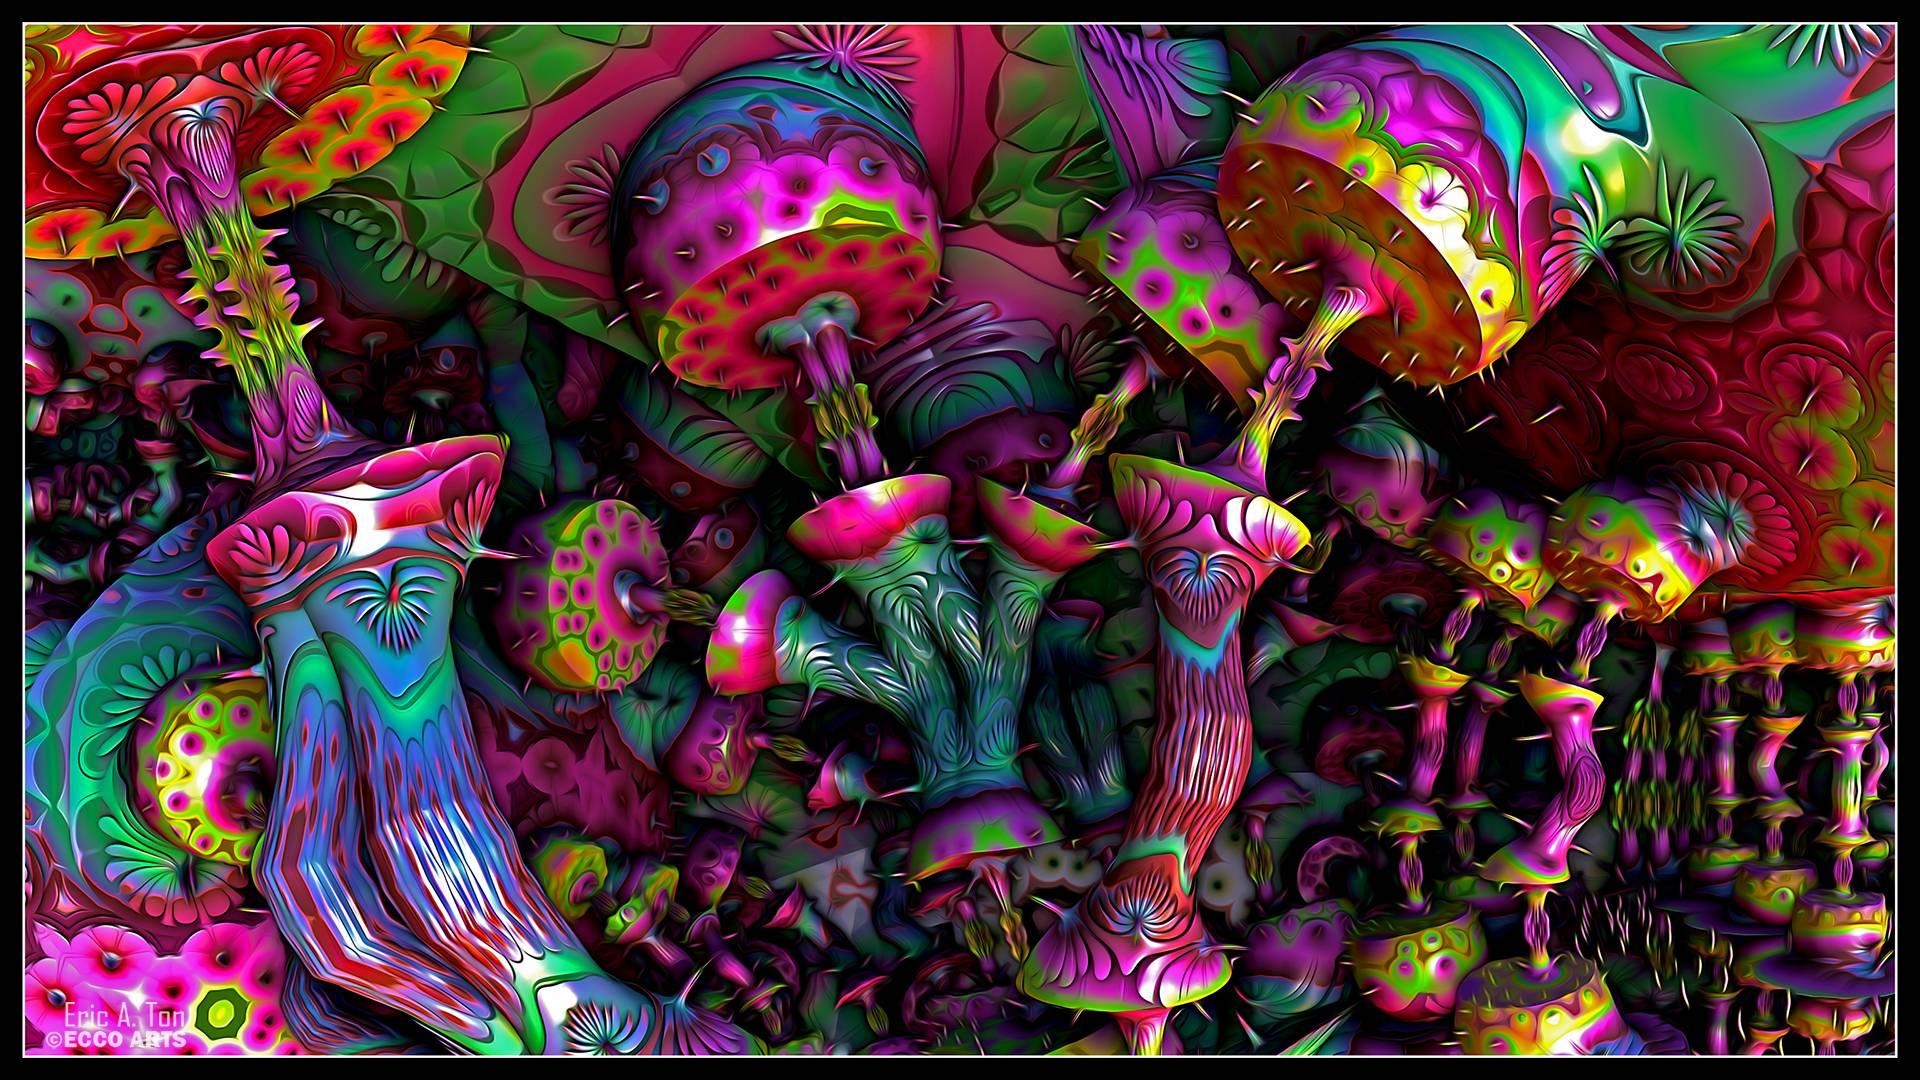 mushroom family wallpaper desktop - photo #33